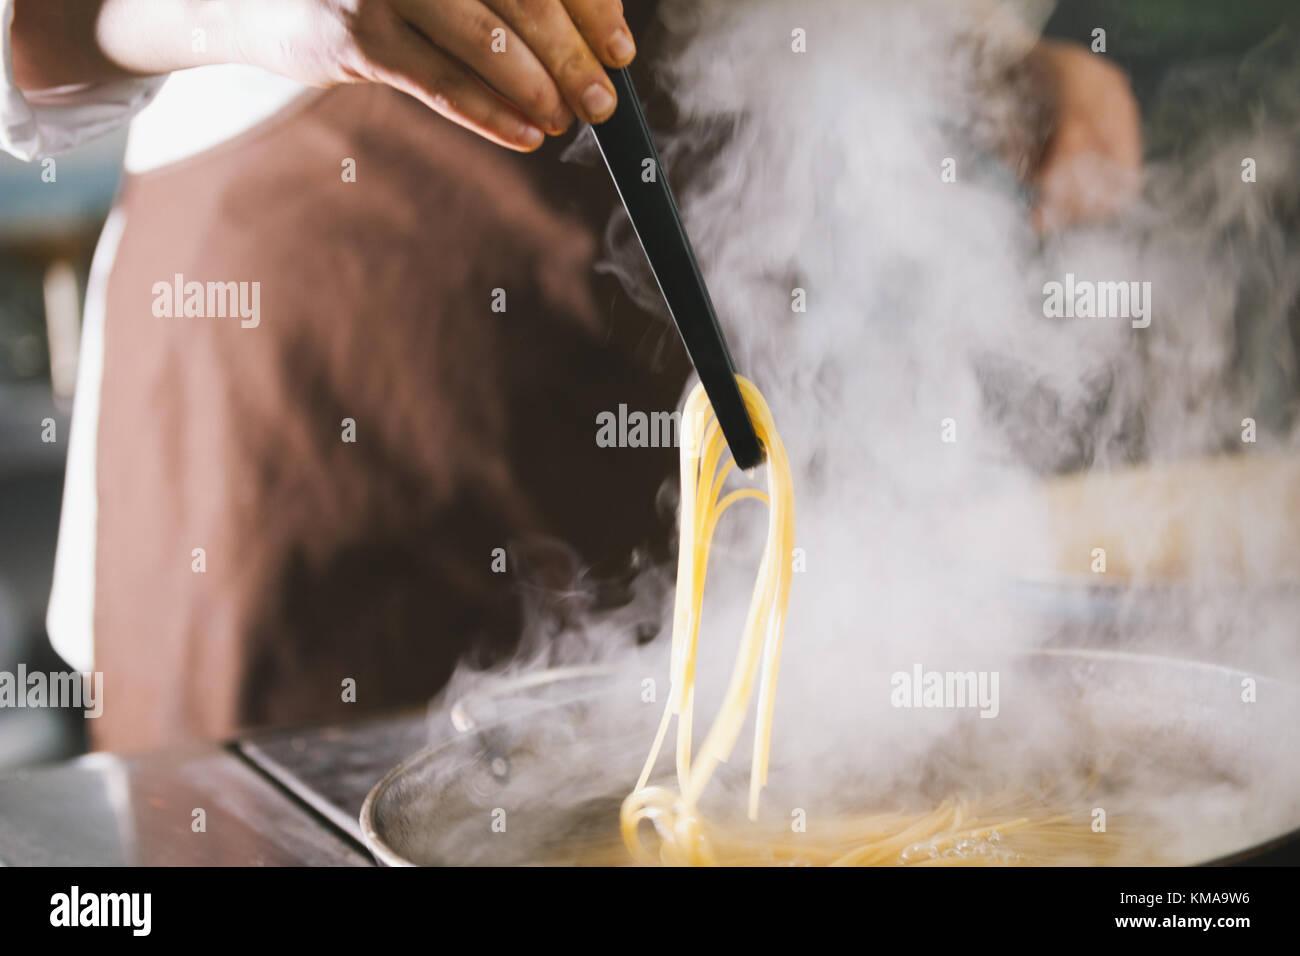 Chef cooking spaghetti dans restaurant Photo Stock